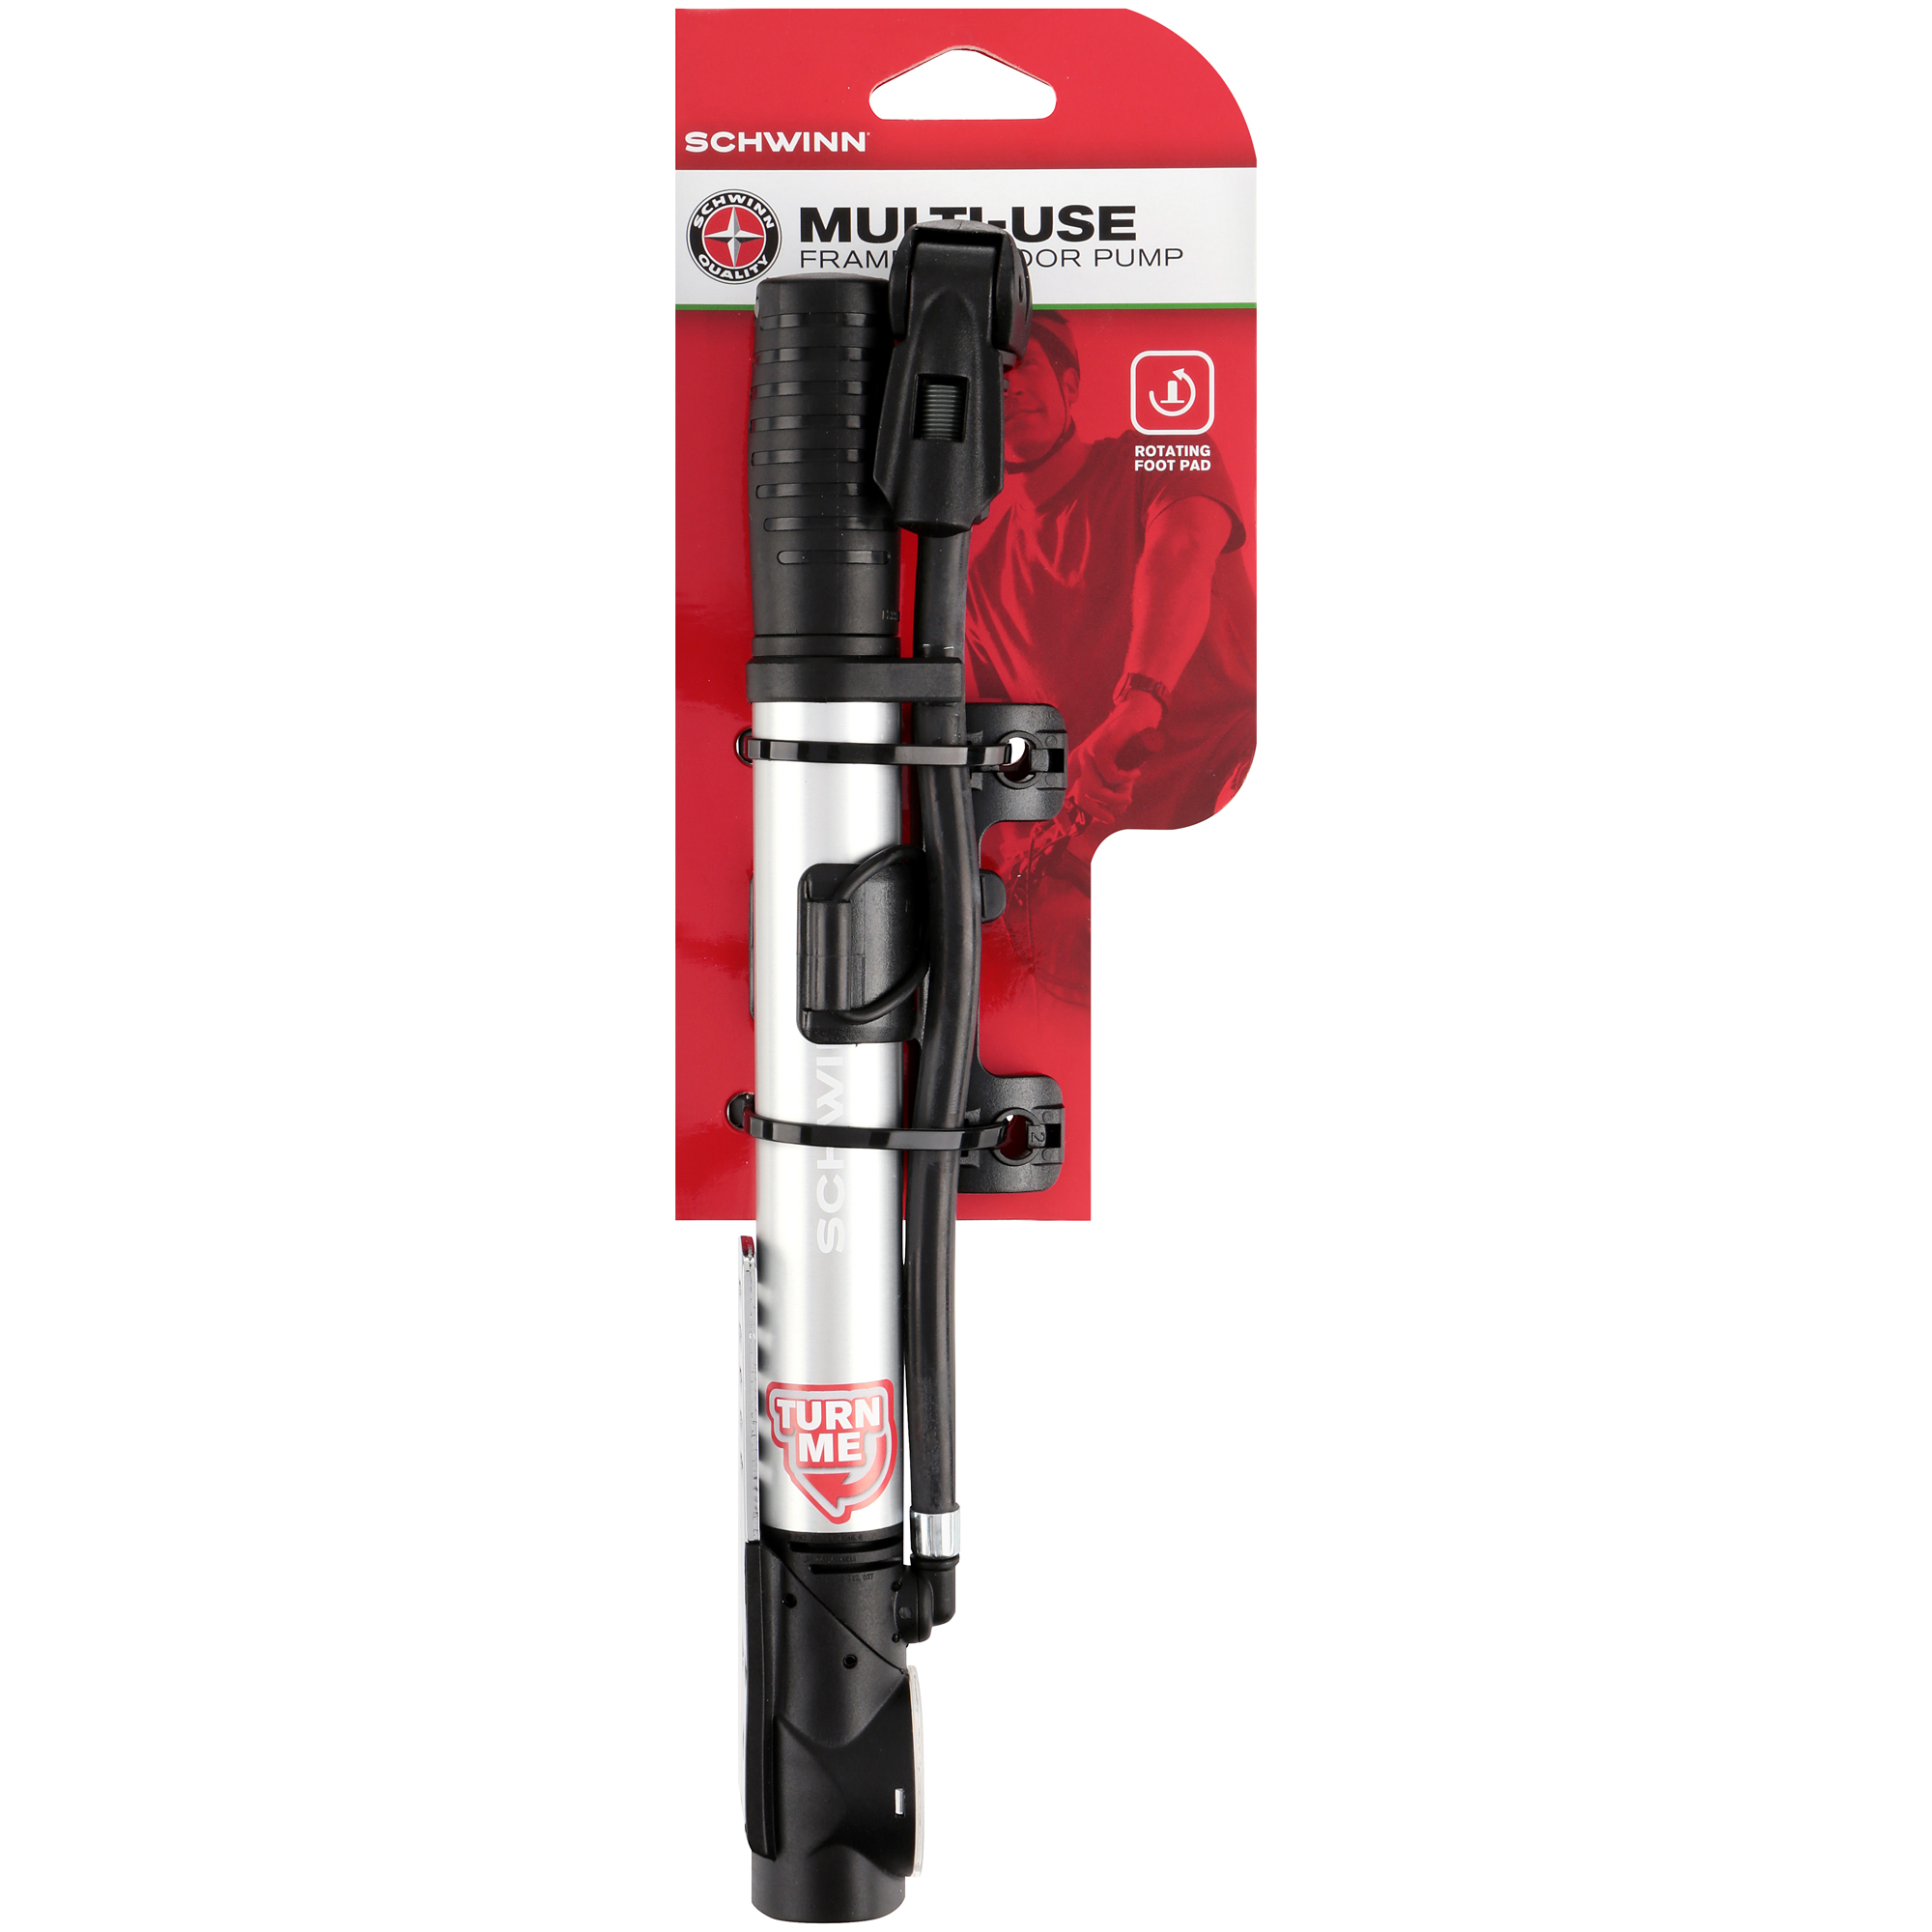 Schwinn® Multi-Use Frame to Floor Bike Pump, Silver/Black - Walmart.com